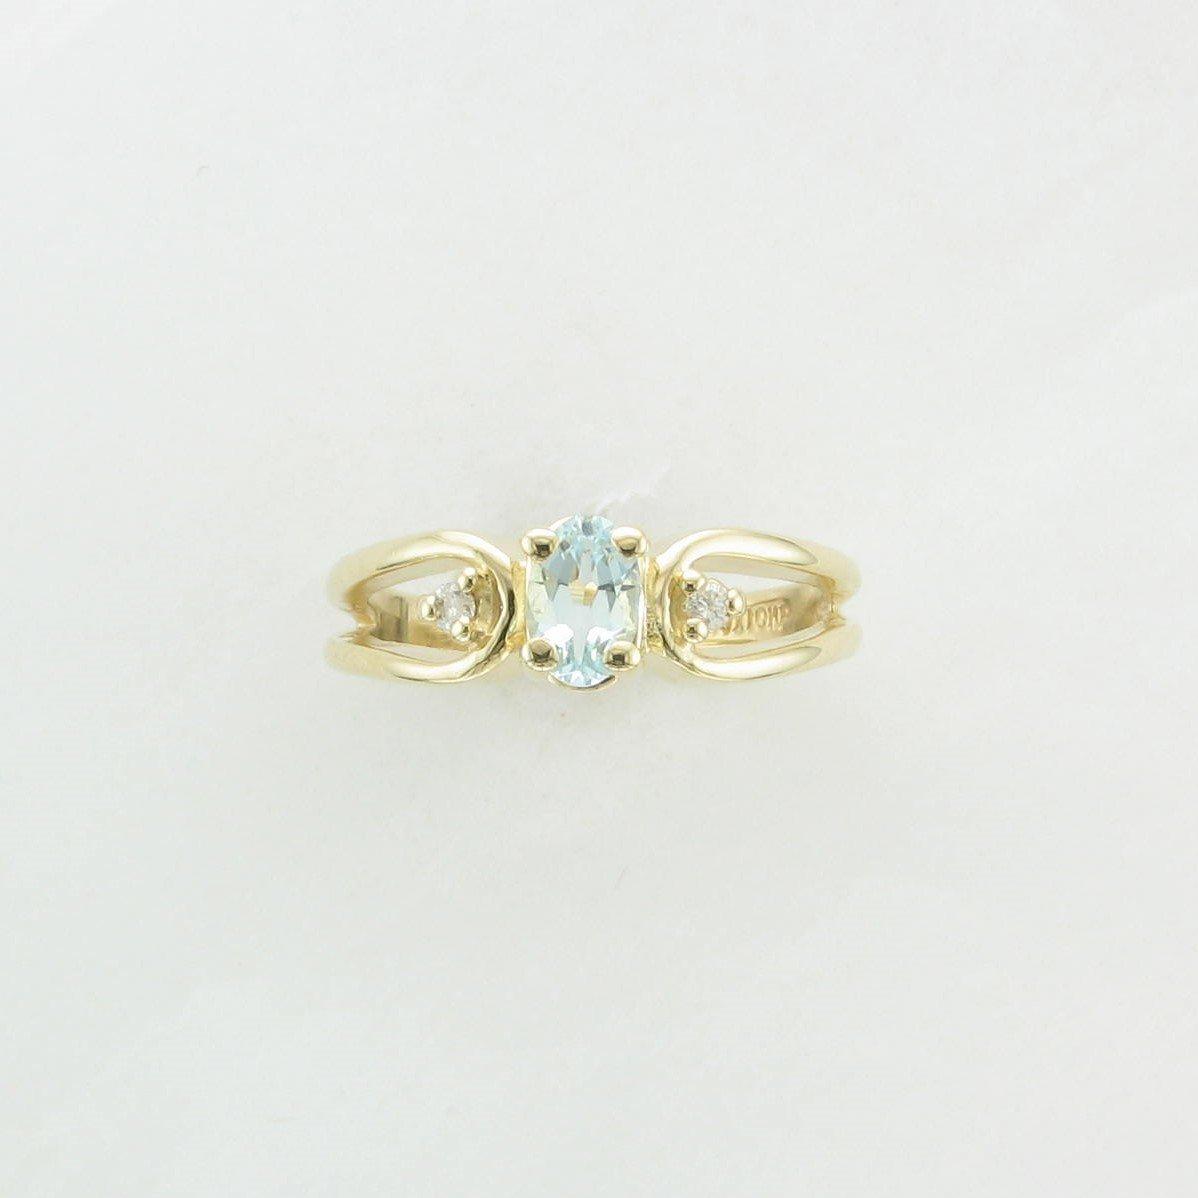 0.60ct Oval Aquamarine & Diamond Ring set in 10k Yellow Gold